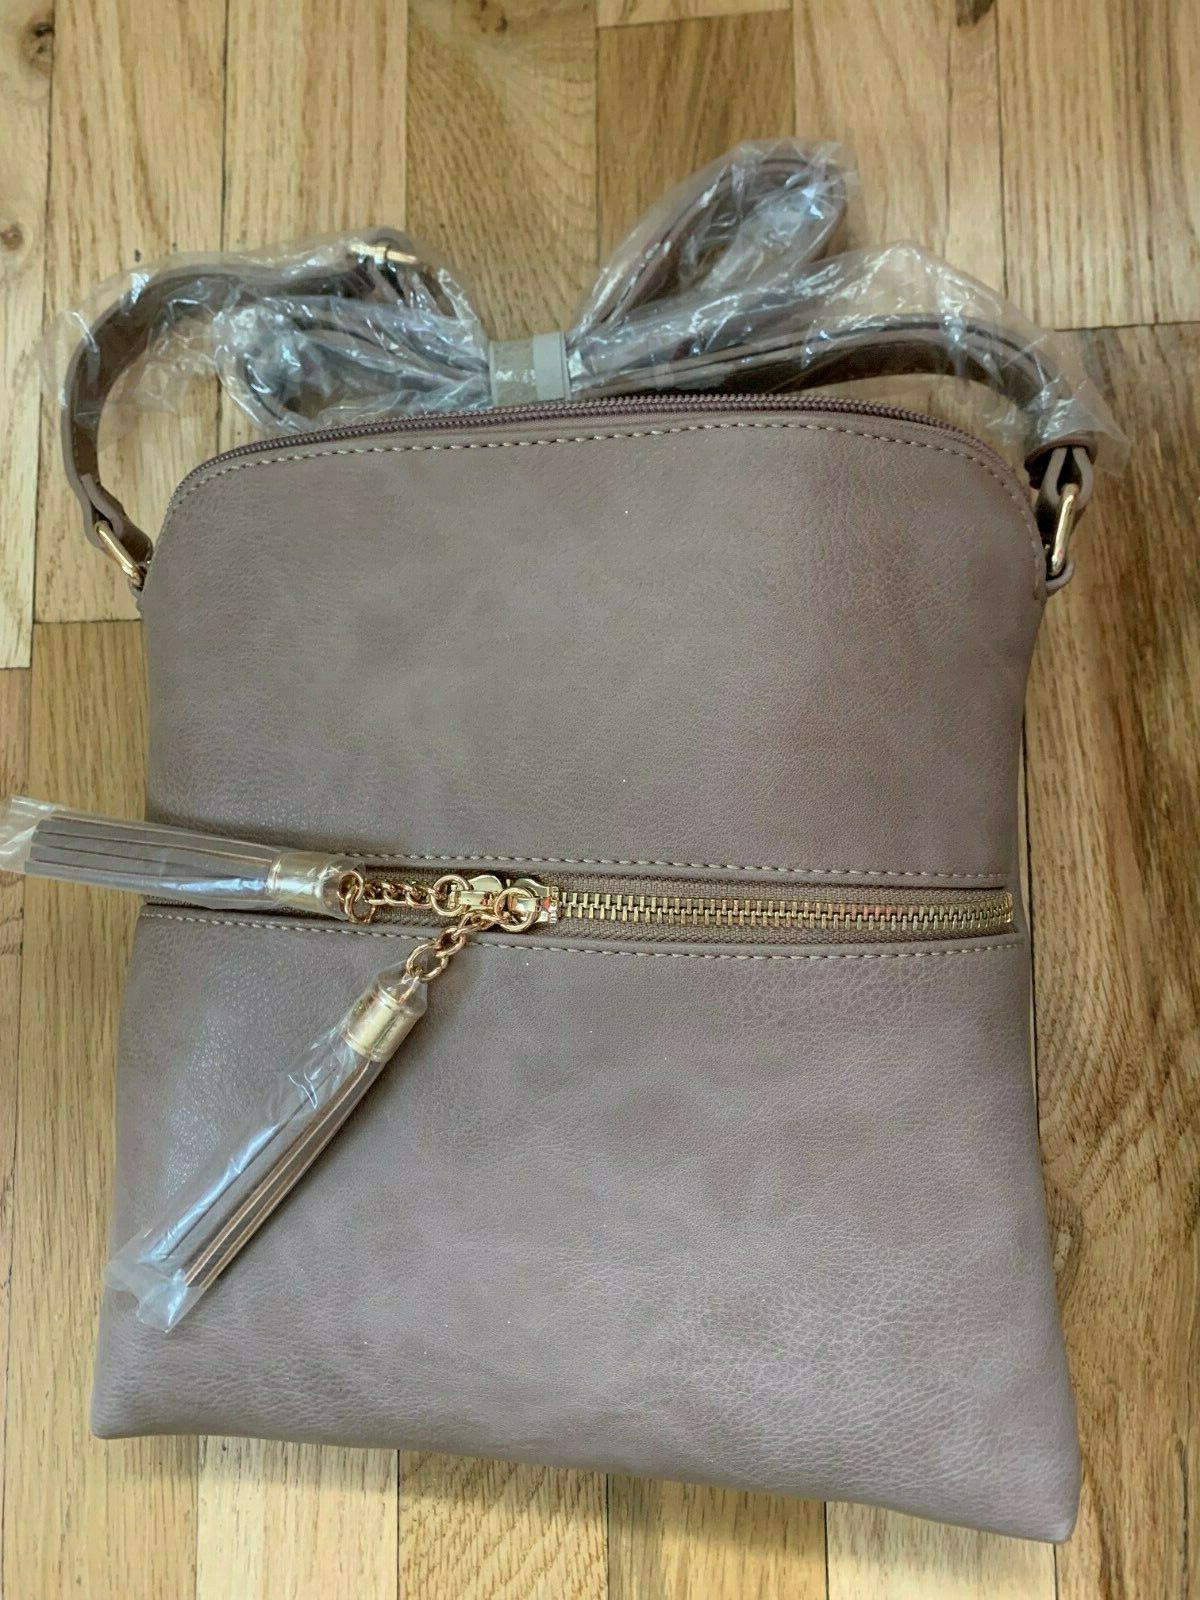 Tassel Zip Crossbody Bag in Taupe- lightweight